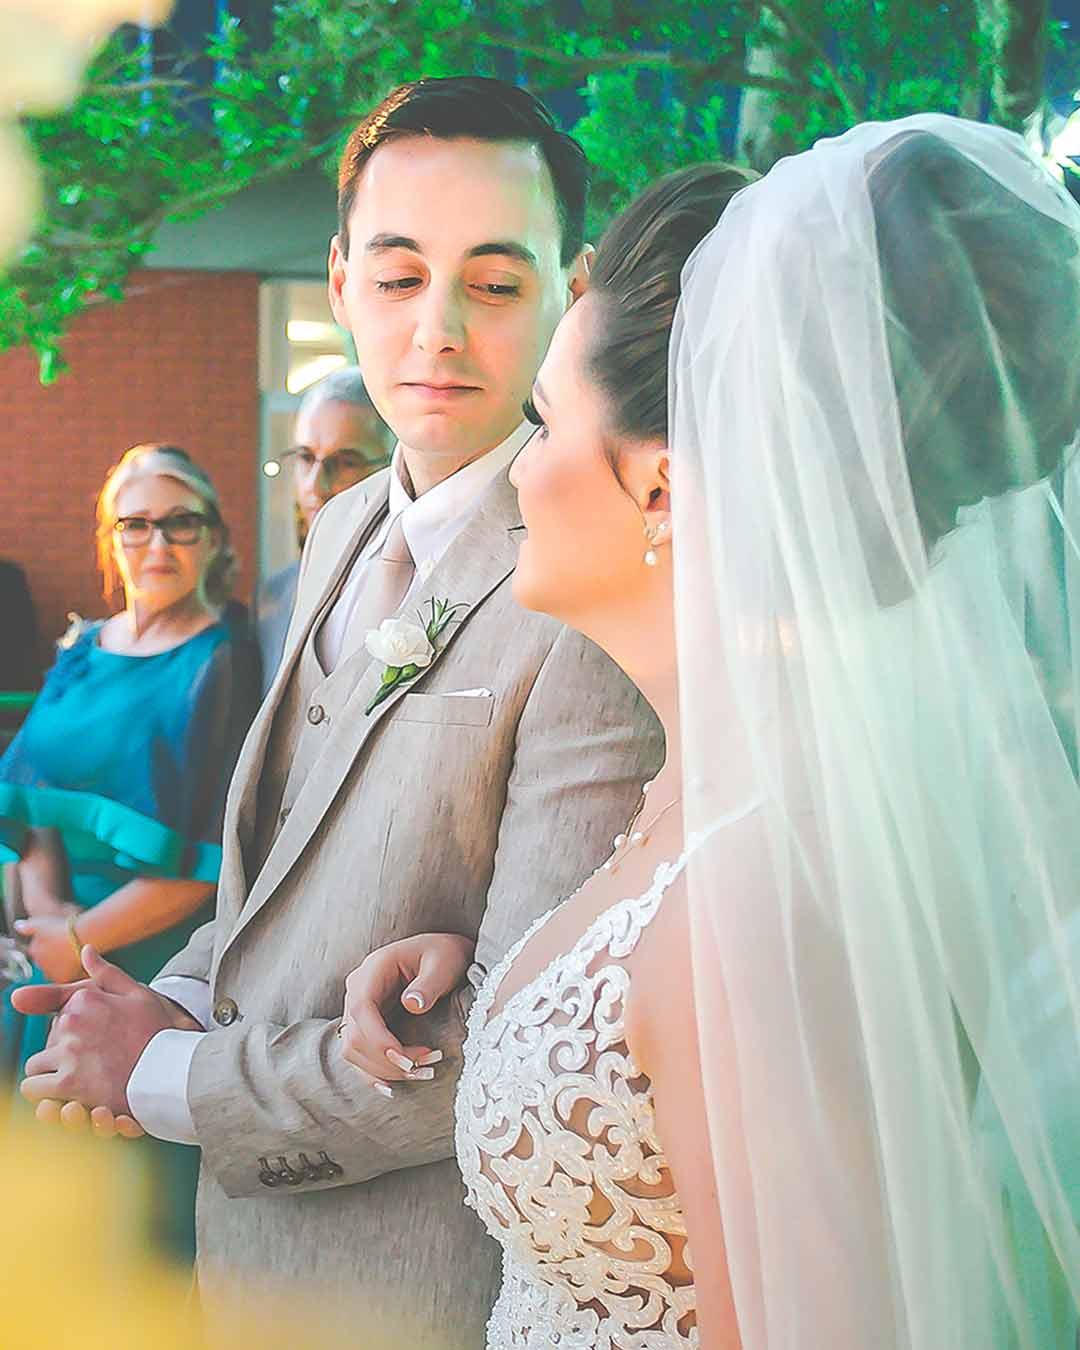 Fotos noivos se olhando casamento porto alegre